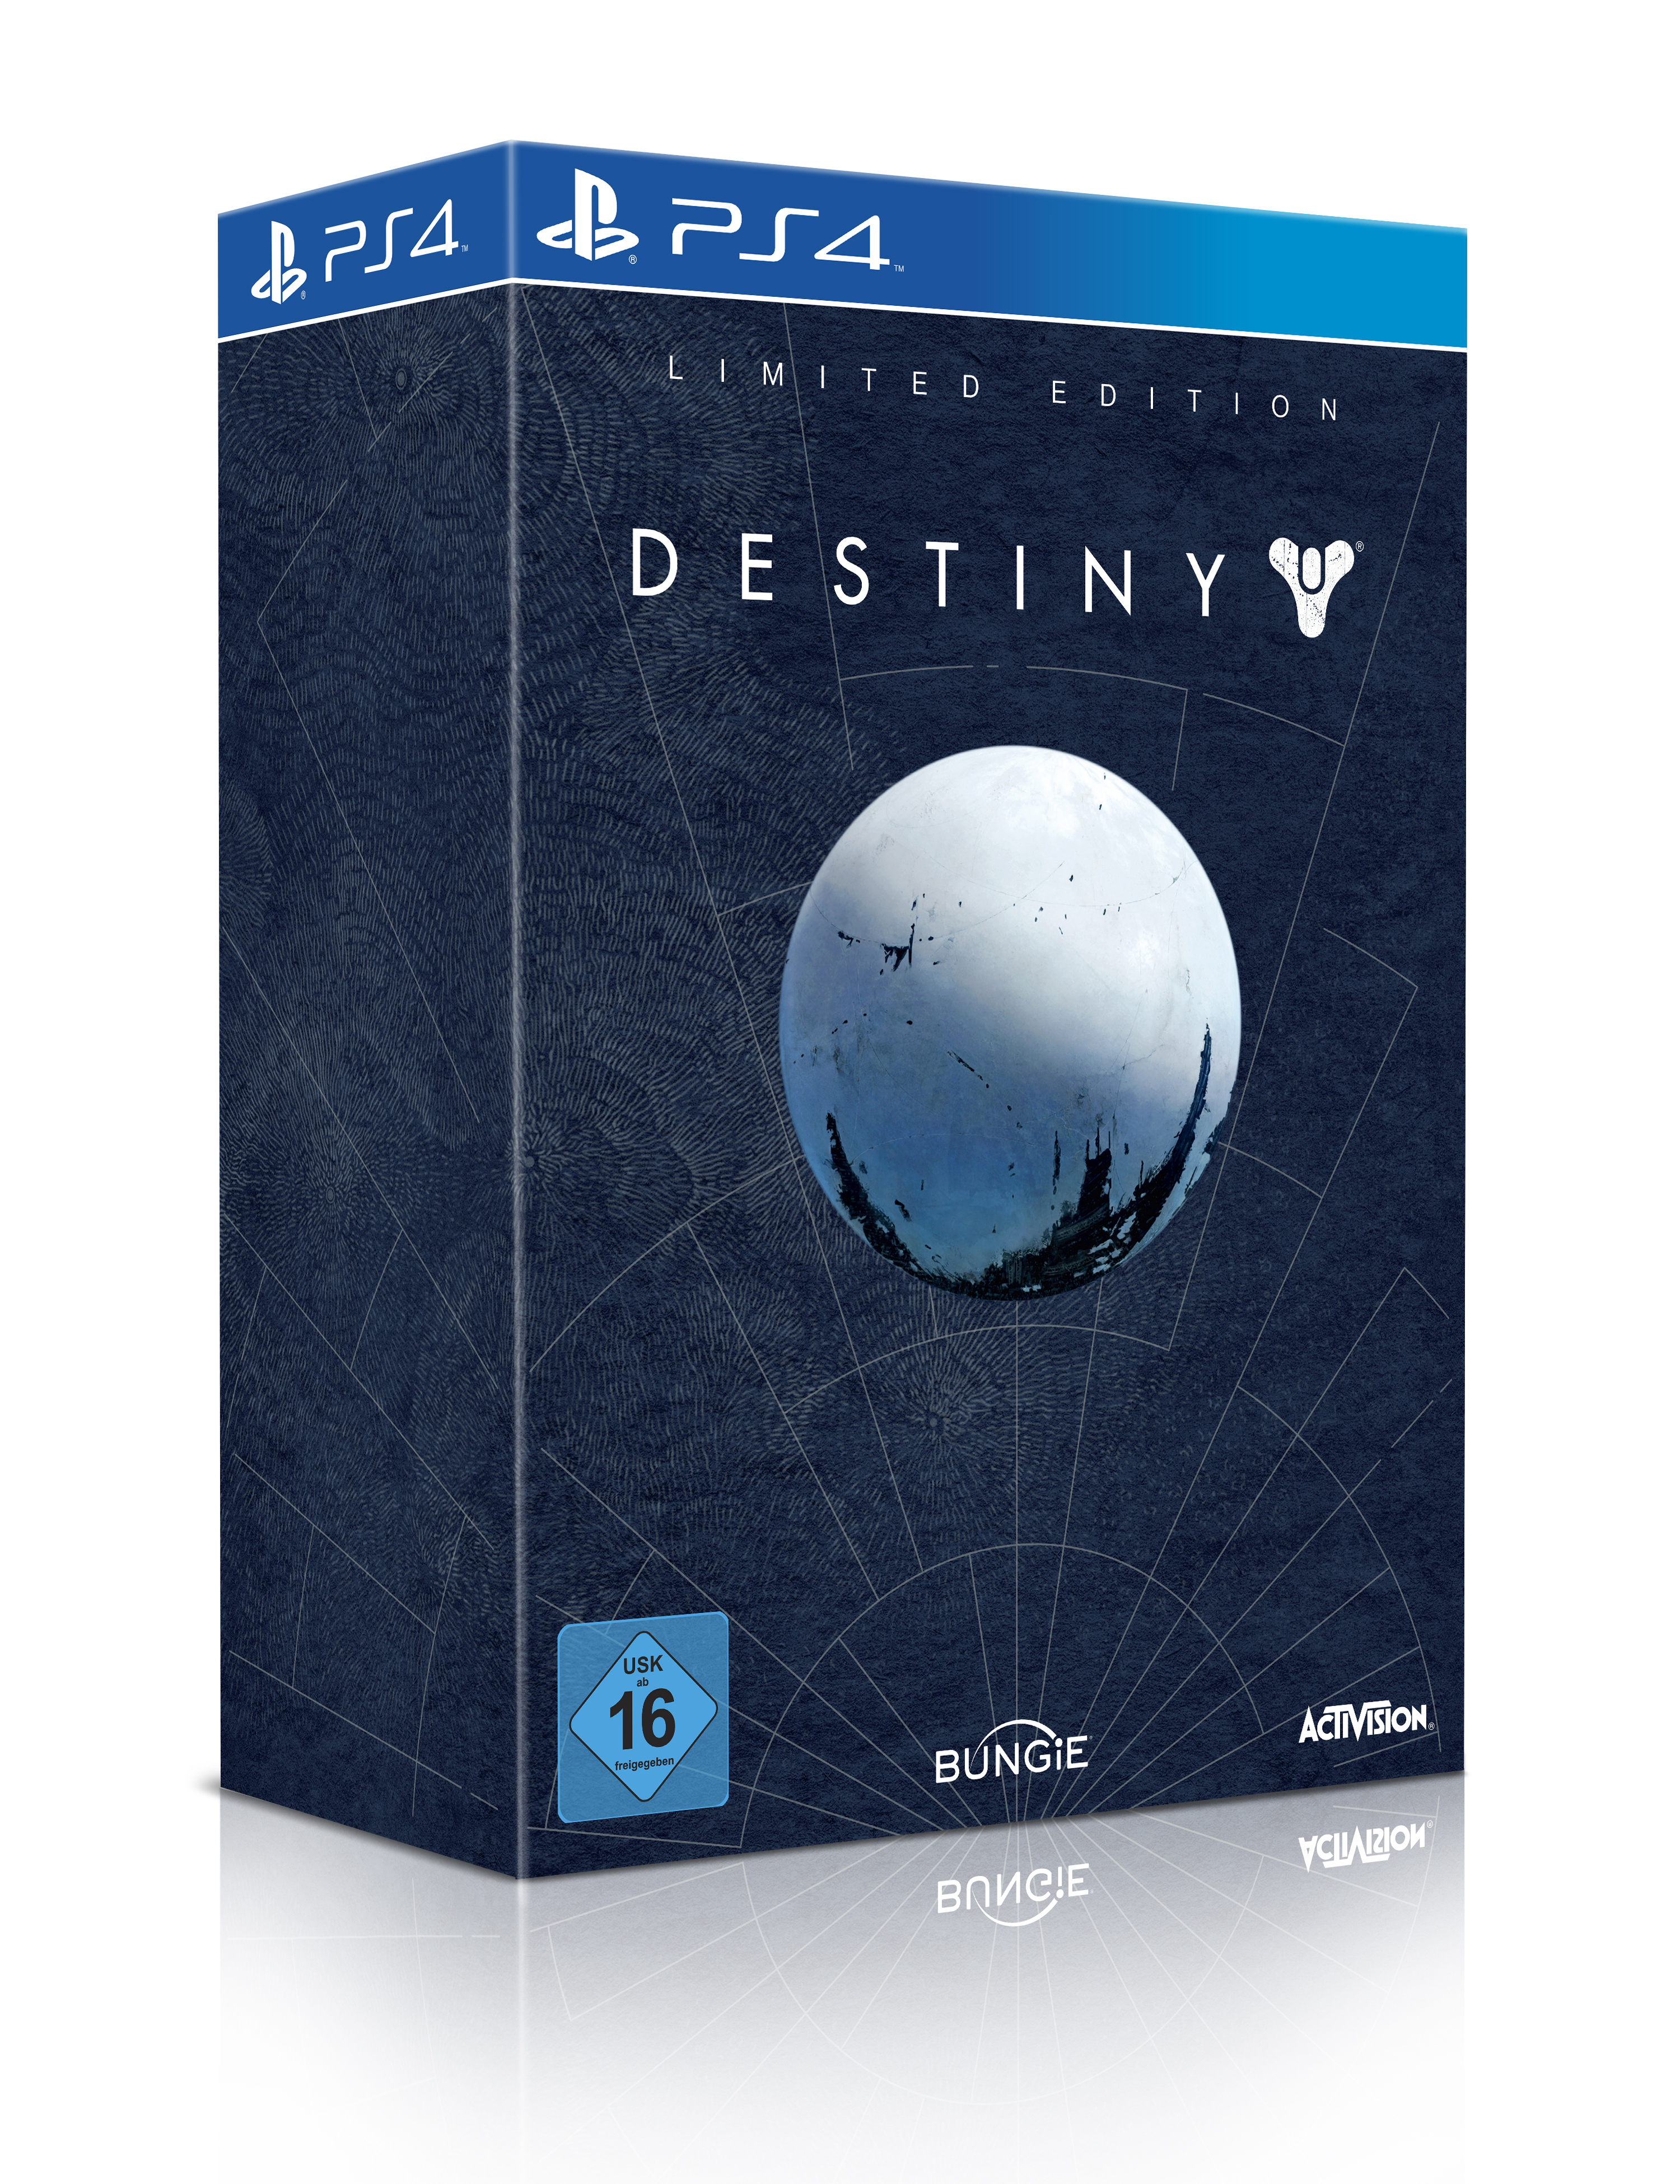 Destiny Limited Edition PS4 3D